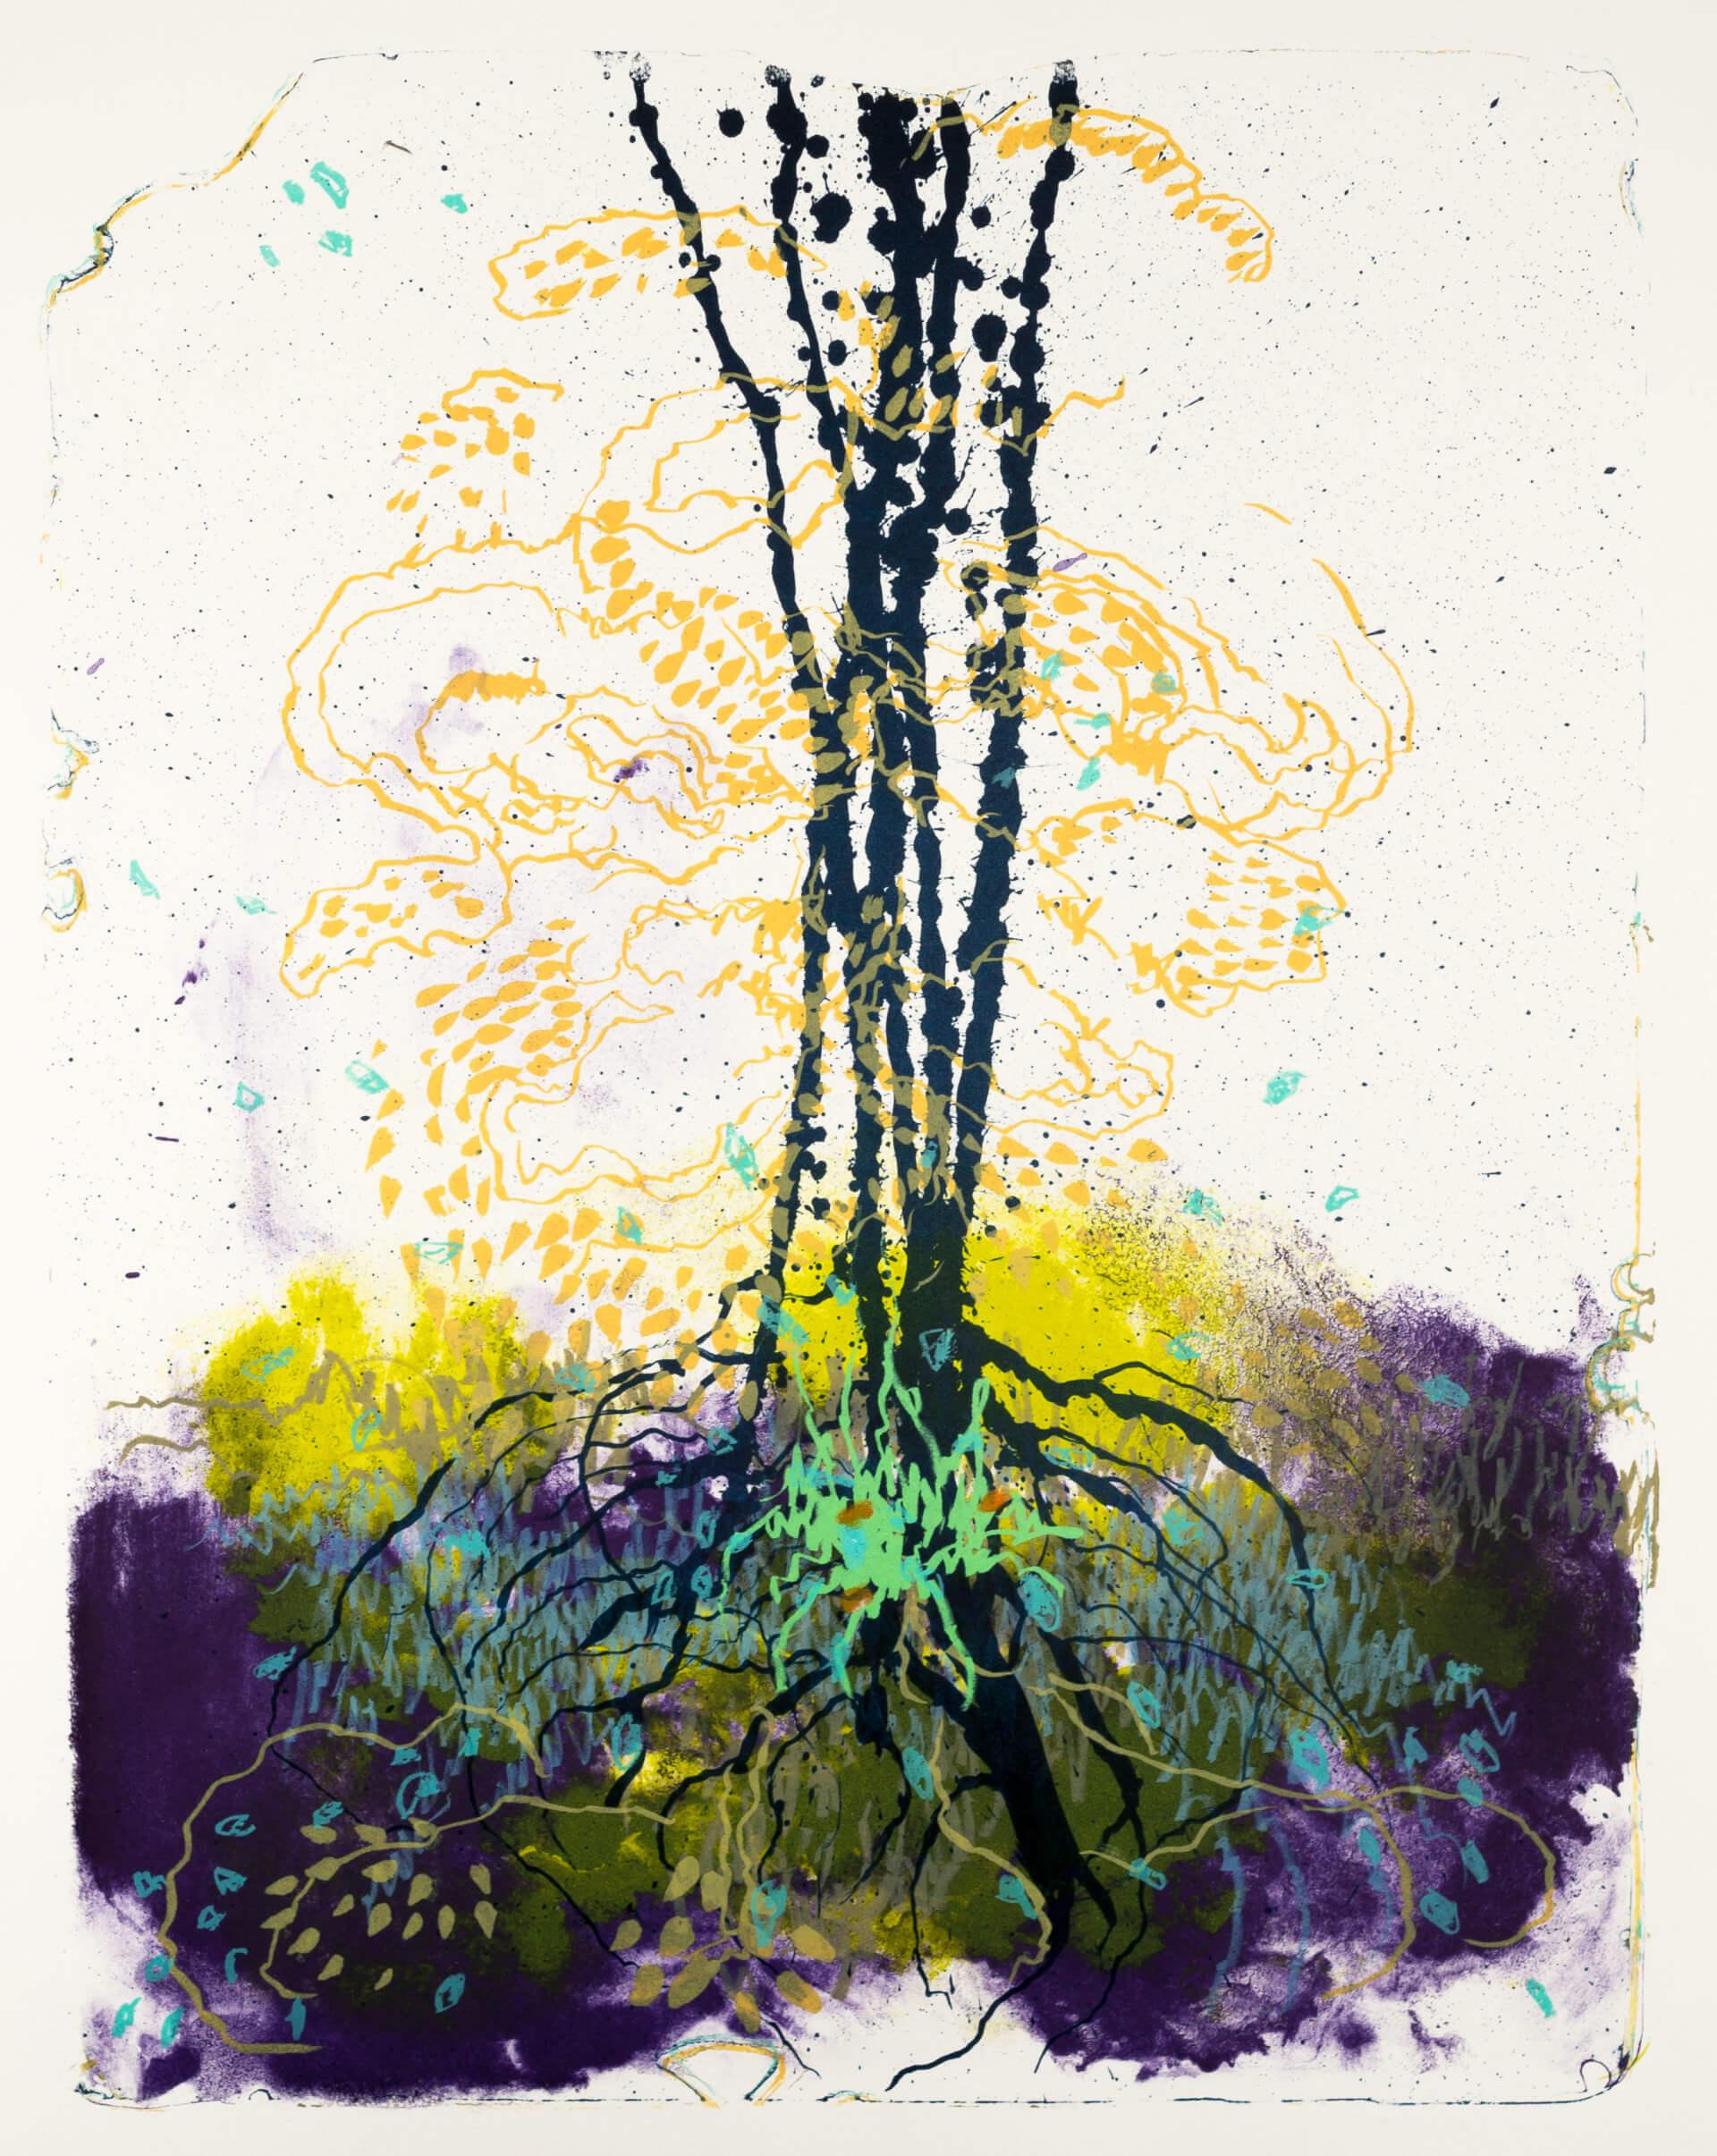 Wald X(D)-VII, 2019, Farblithographie, Unikat, 50x40 cm